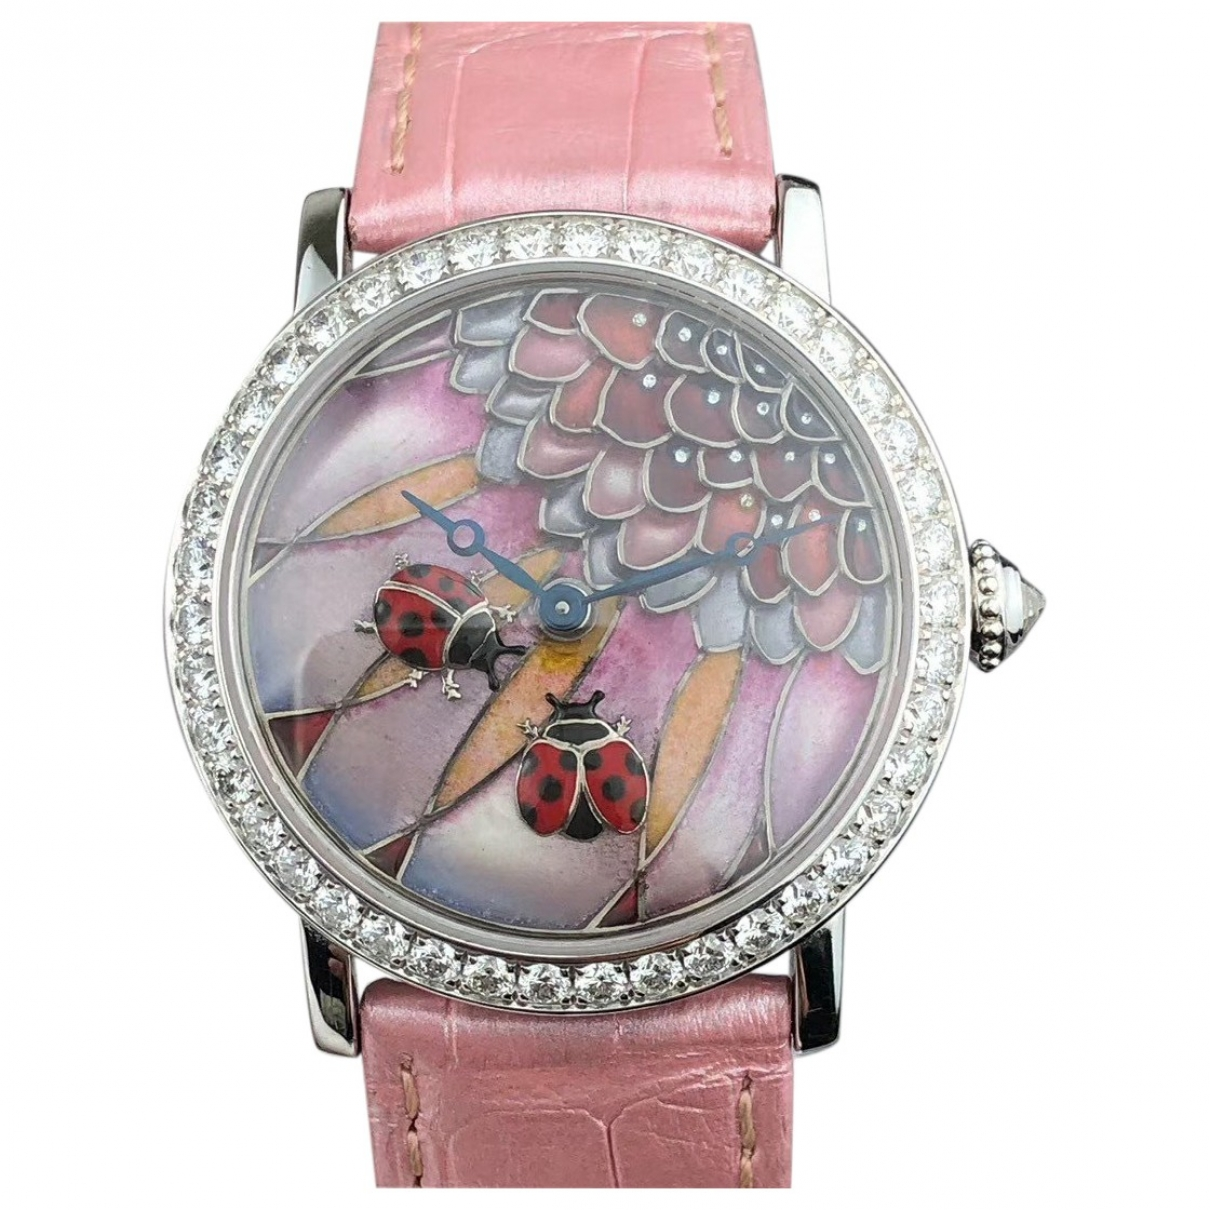 Cartier Rotonde Uhr in Weissgold